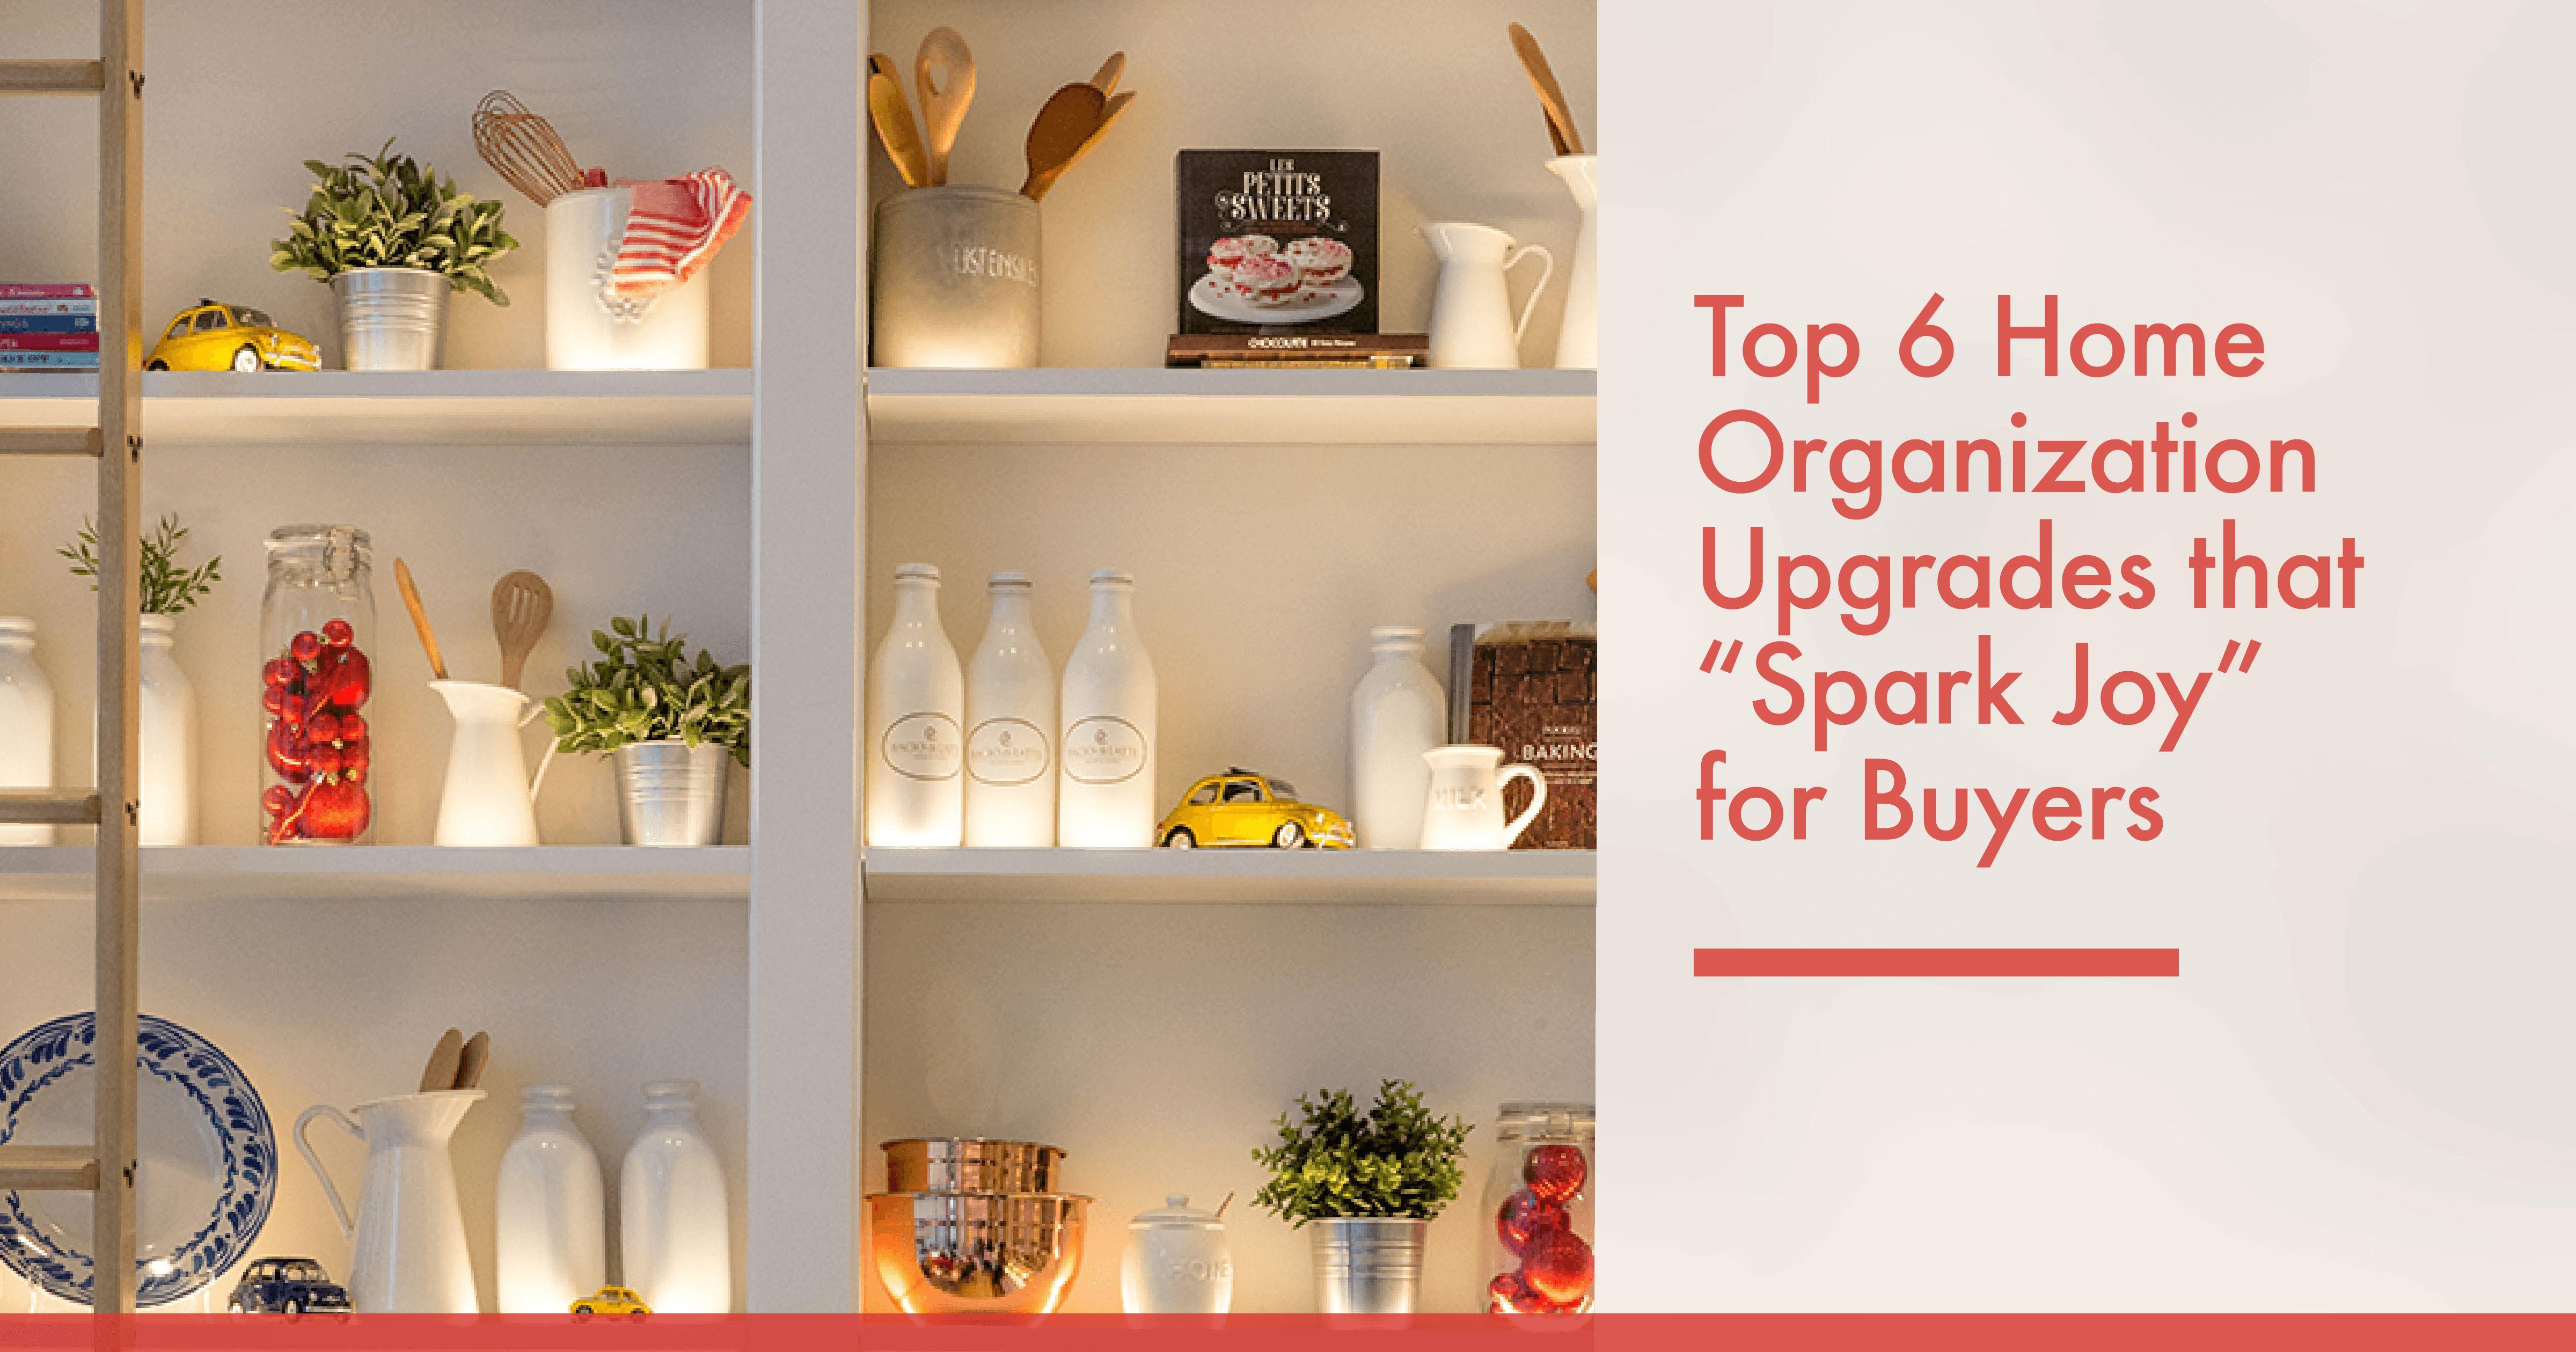 Top 6 Home Organization Upgrades